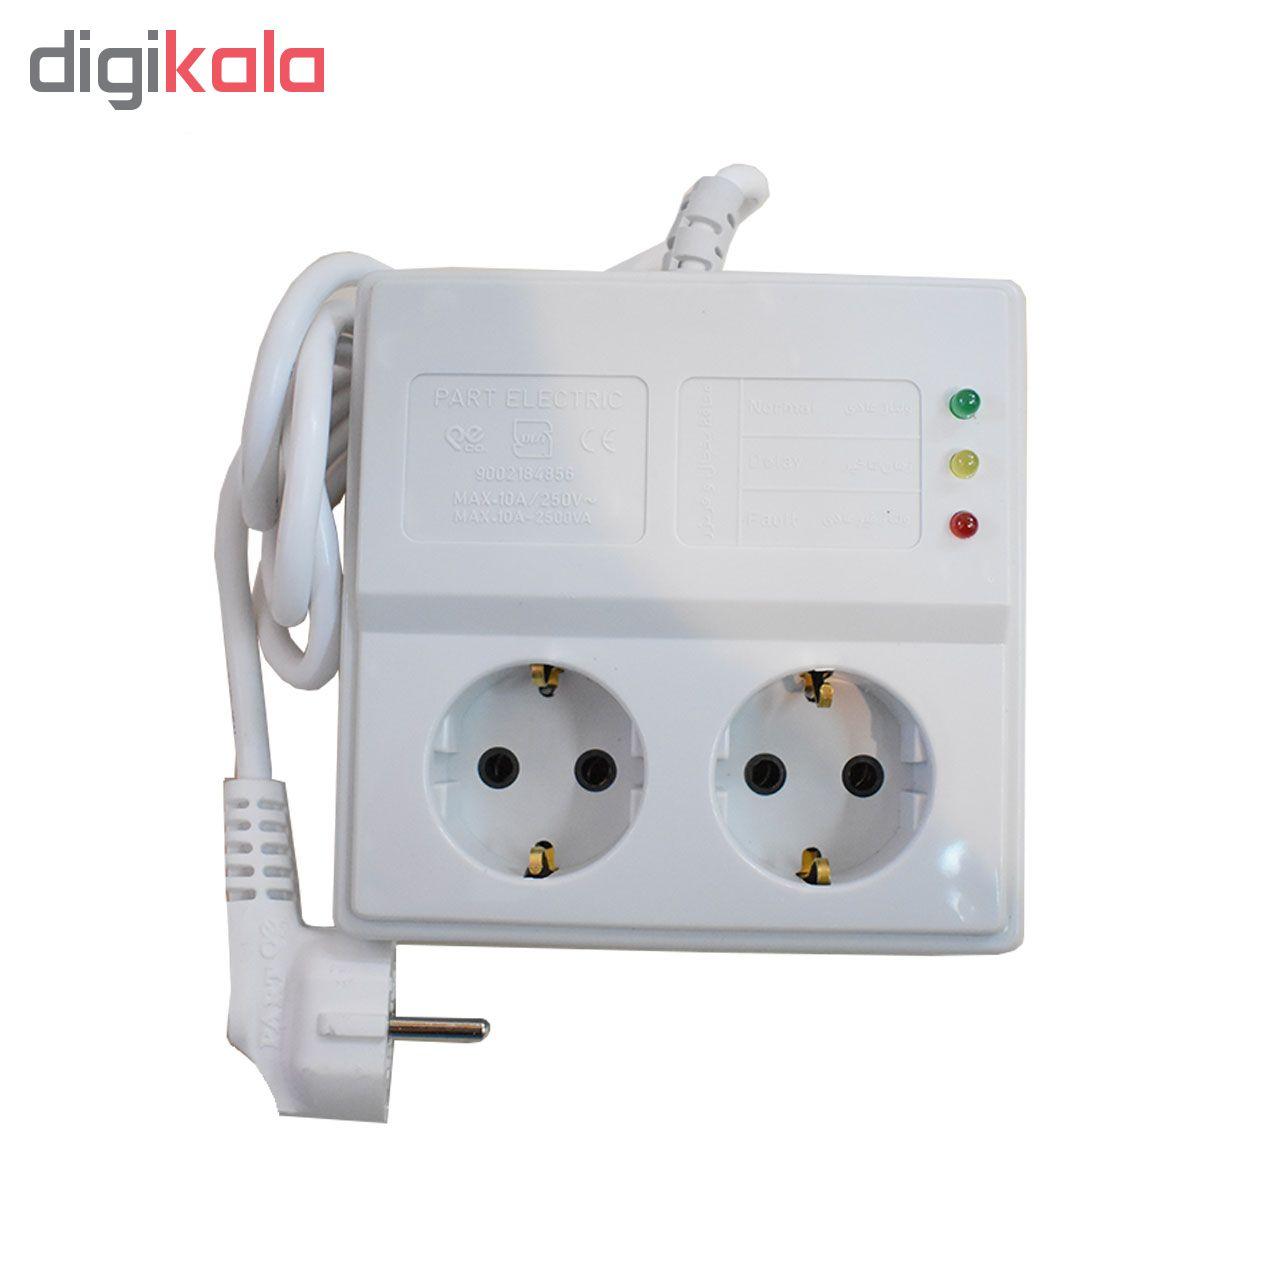 محافظ ولتاژ آنالوگ پارت الکتریک مدل Major home appliances main 1 1